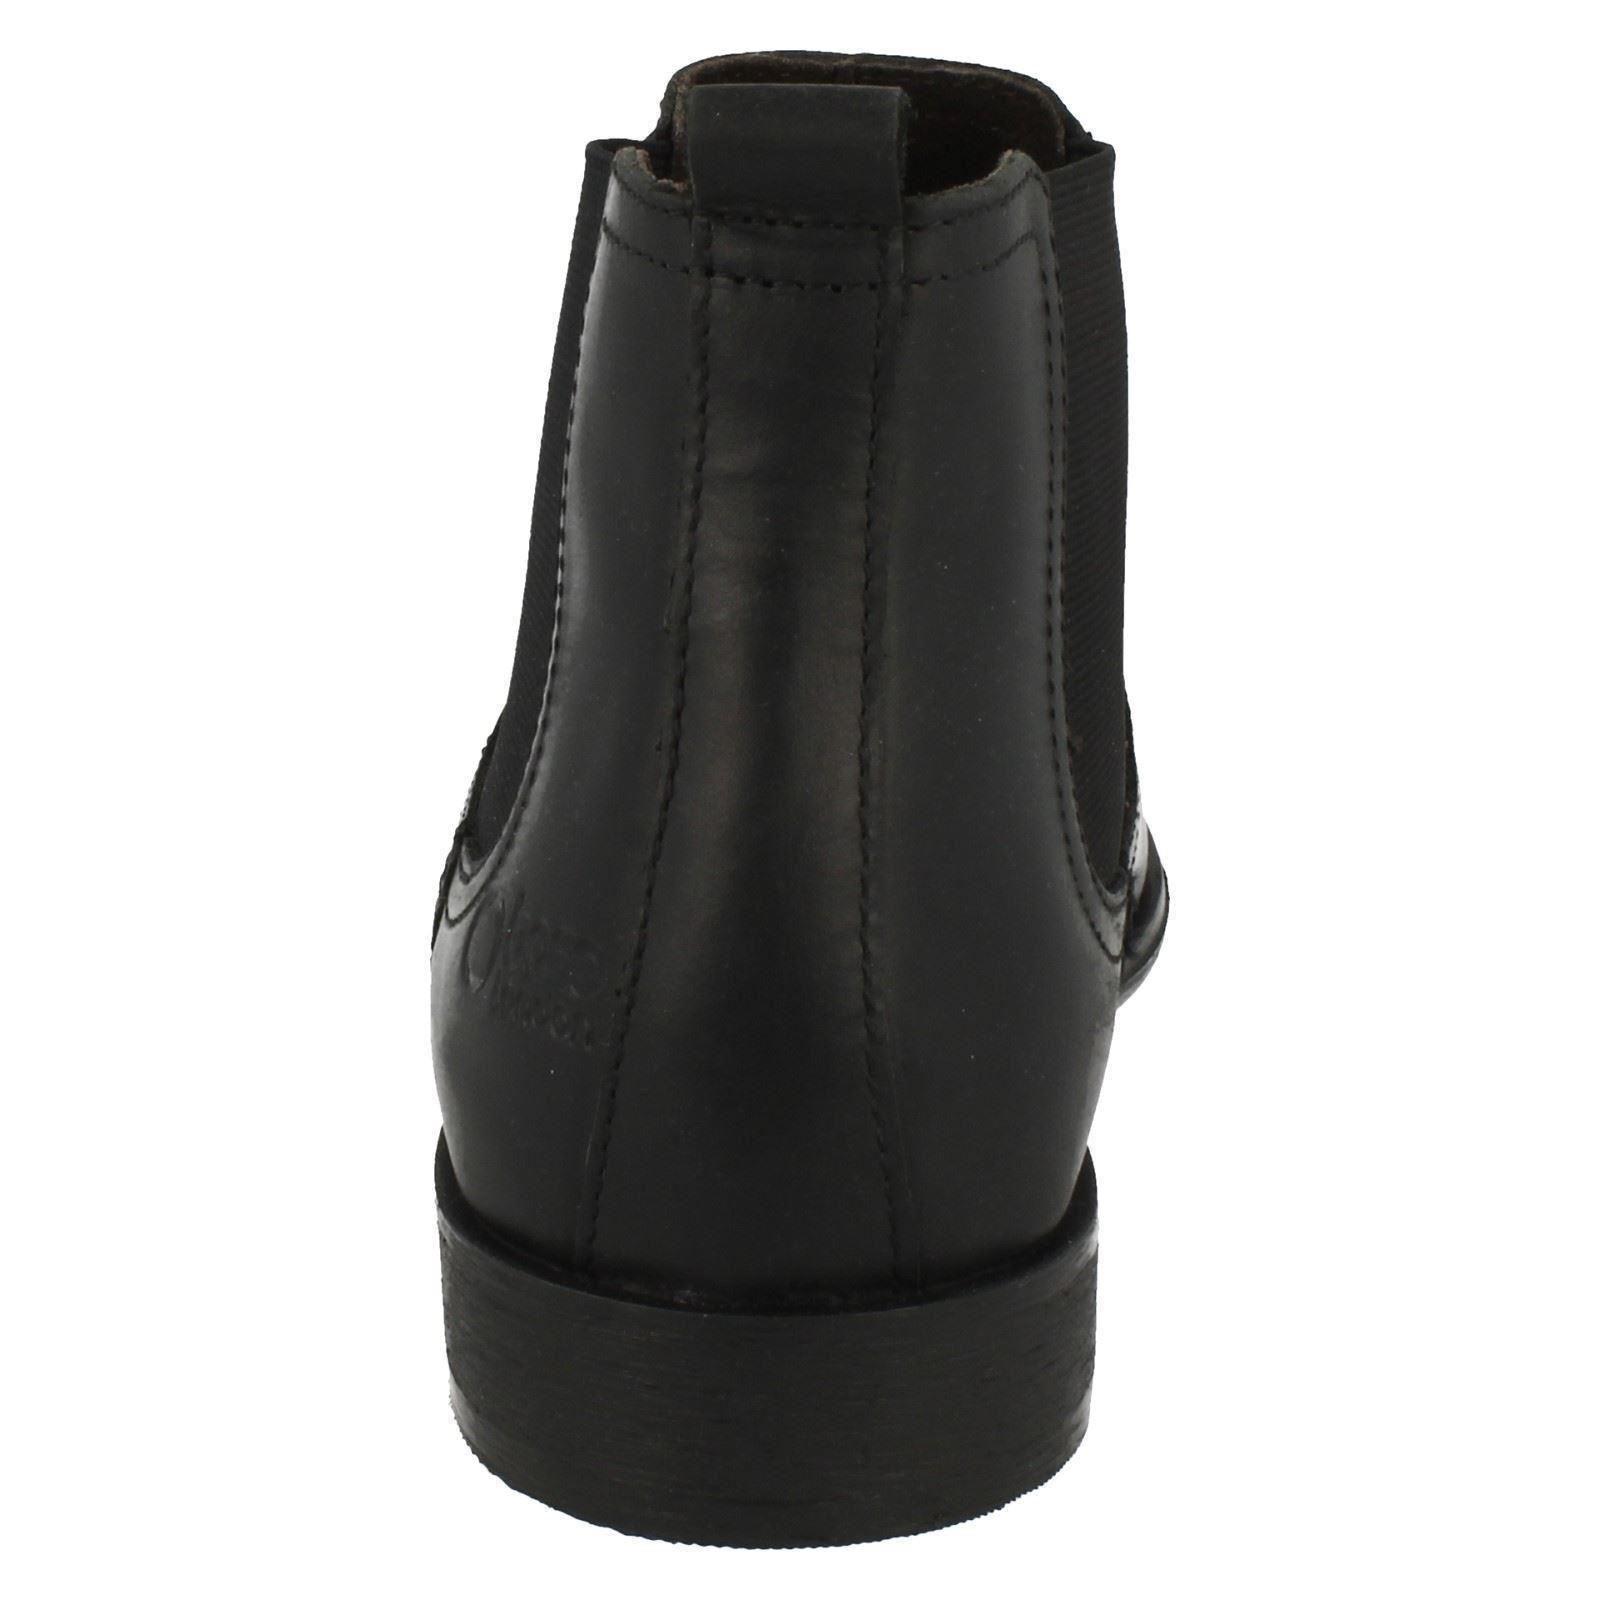 HERREN schwarz/Fettleder Safran Base London Wachsartig schwarz/Fettleder HERREN Braun Leder Stiefel 924ea6